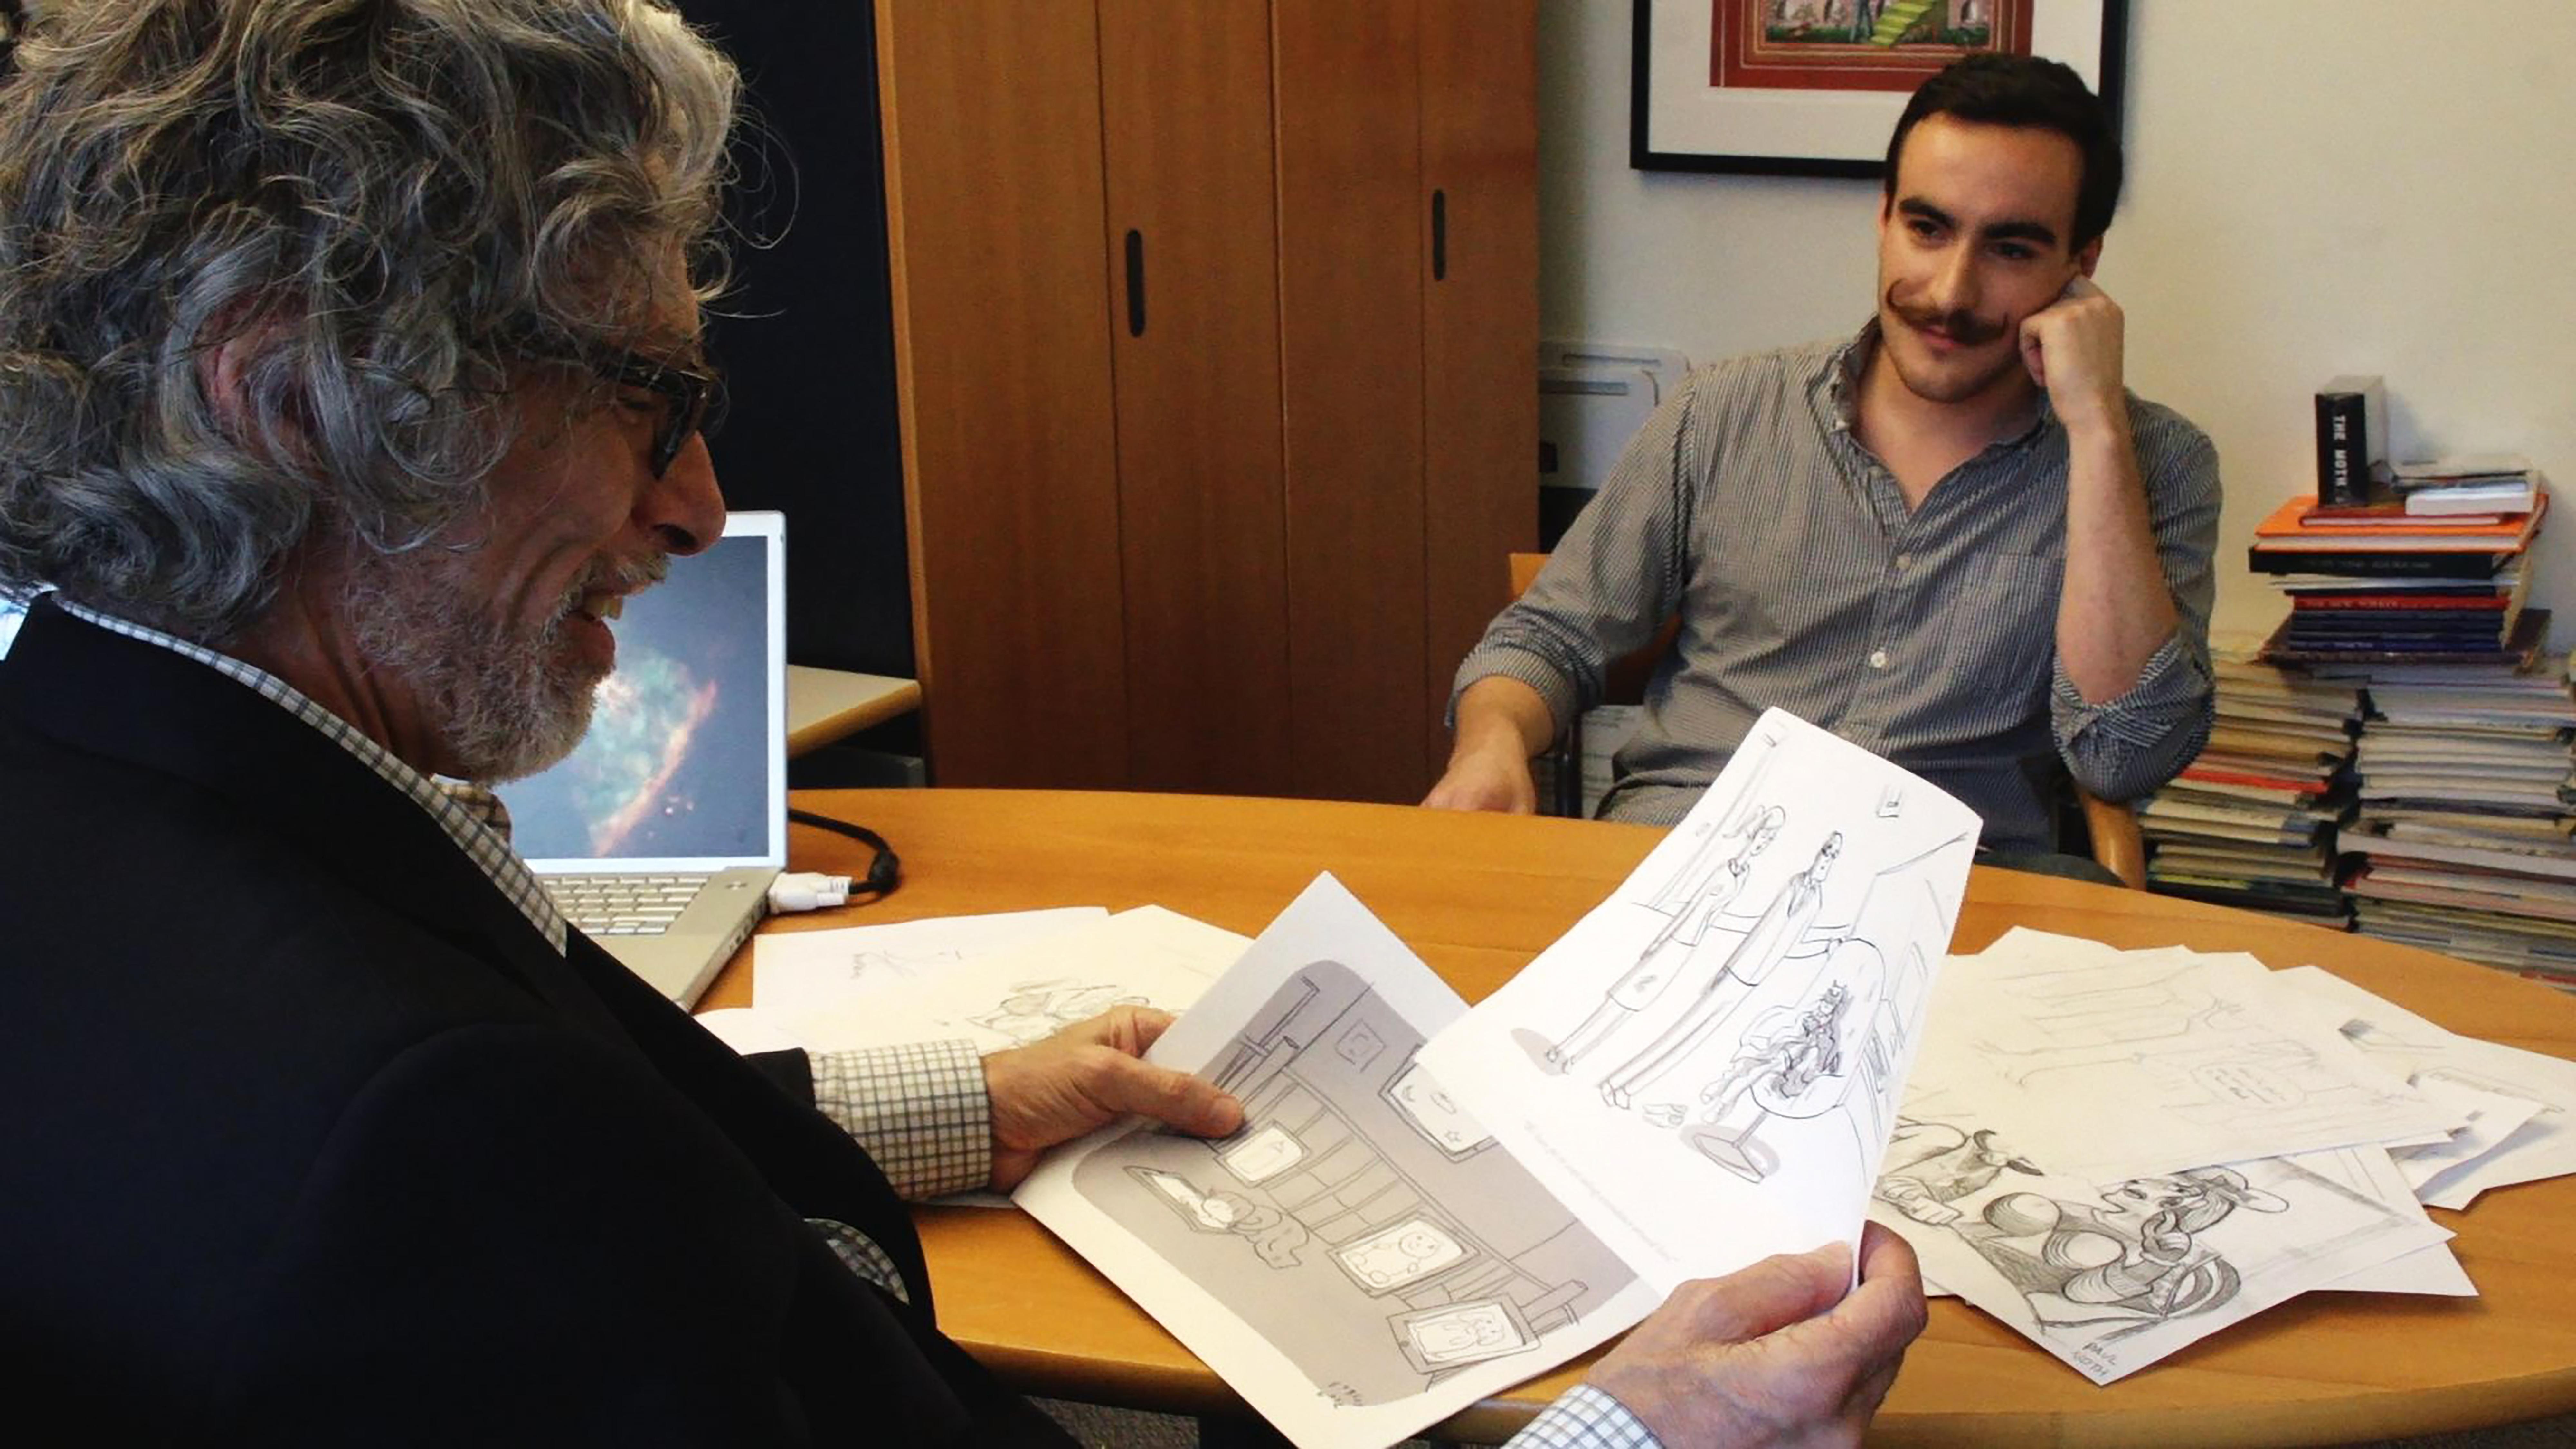 New Yorker cartoon editor Bob Mankoff and cartoonist Farley Katz